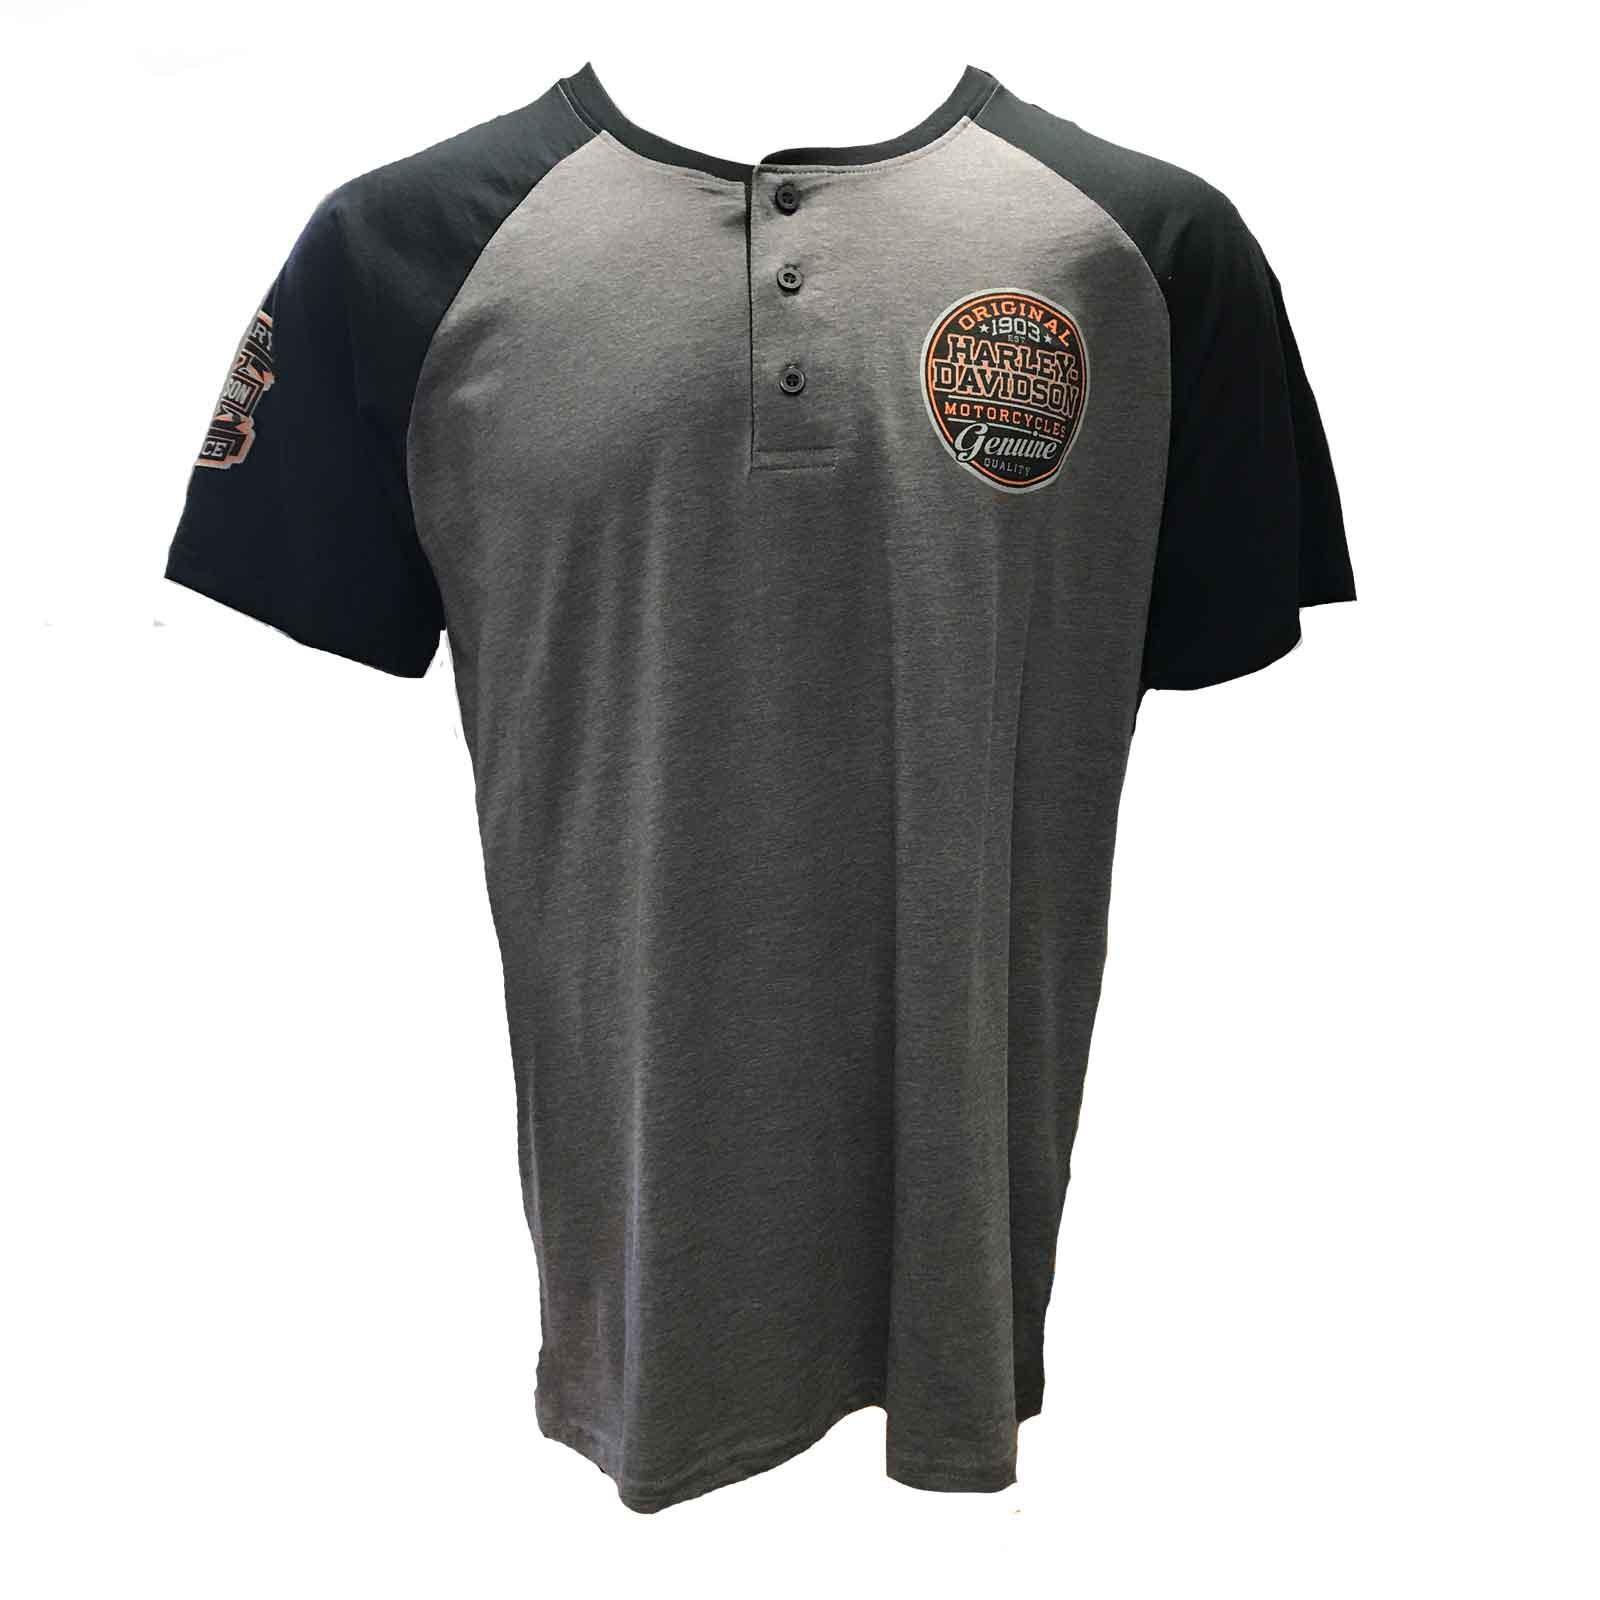 Harley-Davidson Men's Premium Short-Sleeve Henley Shirt - Stronghold | NSA Bahrain